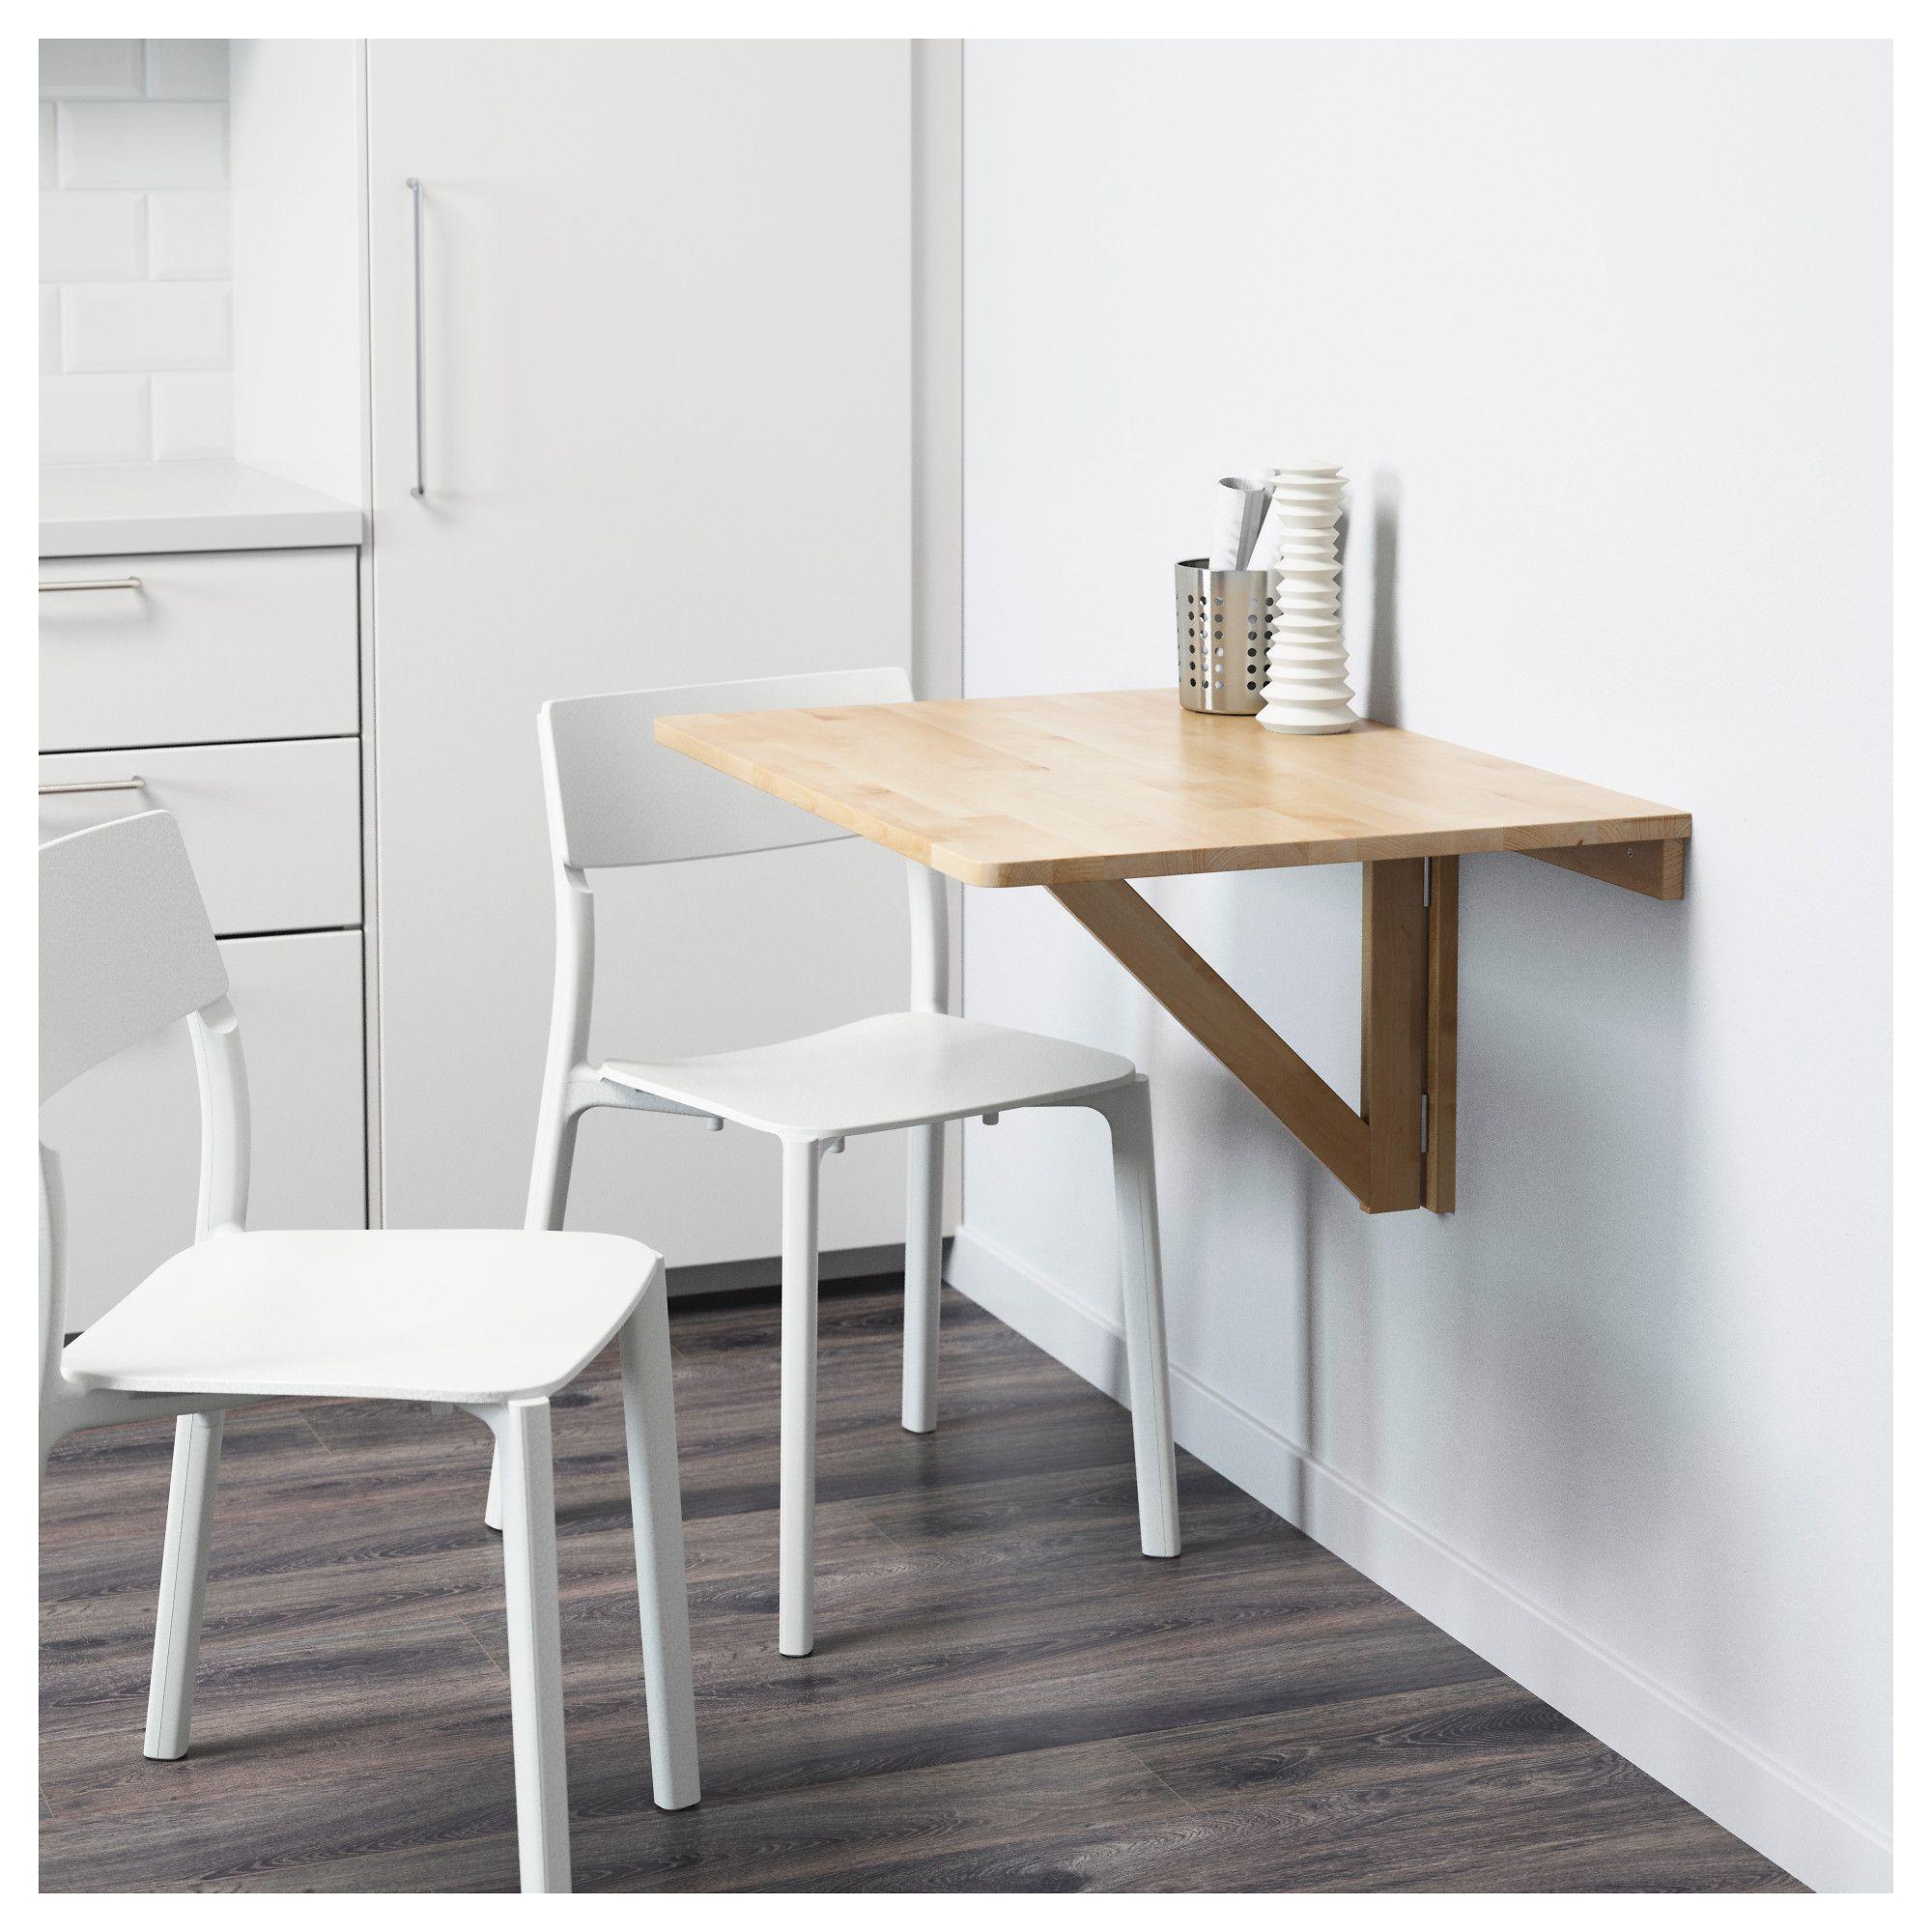 norbo wall mounted drop leaf table birch 79x59 cm drop leaf table rh pinterest com